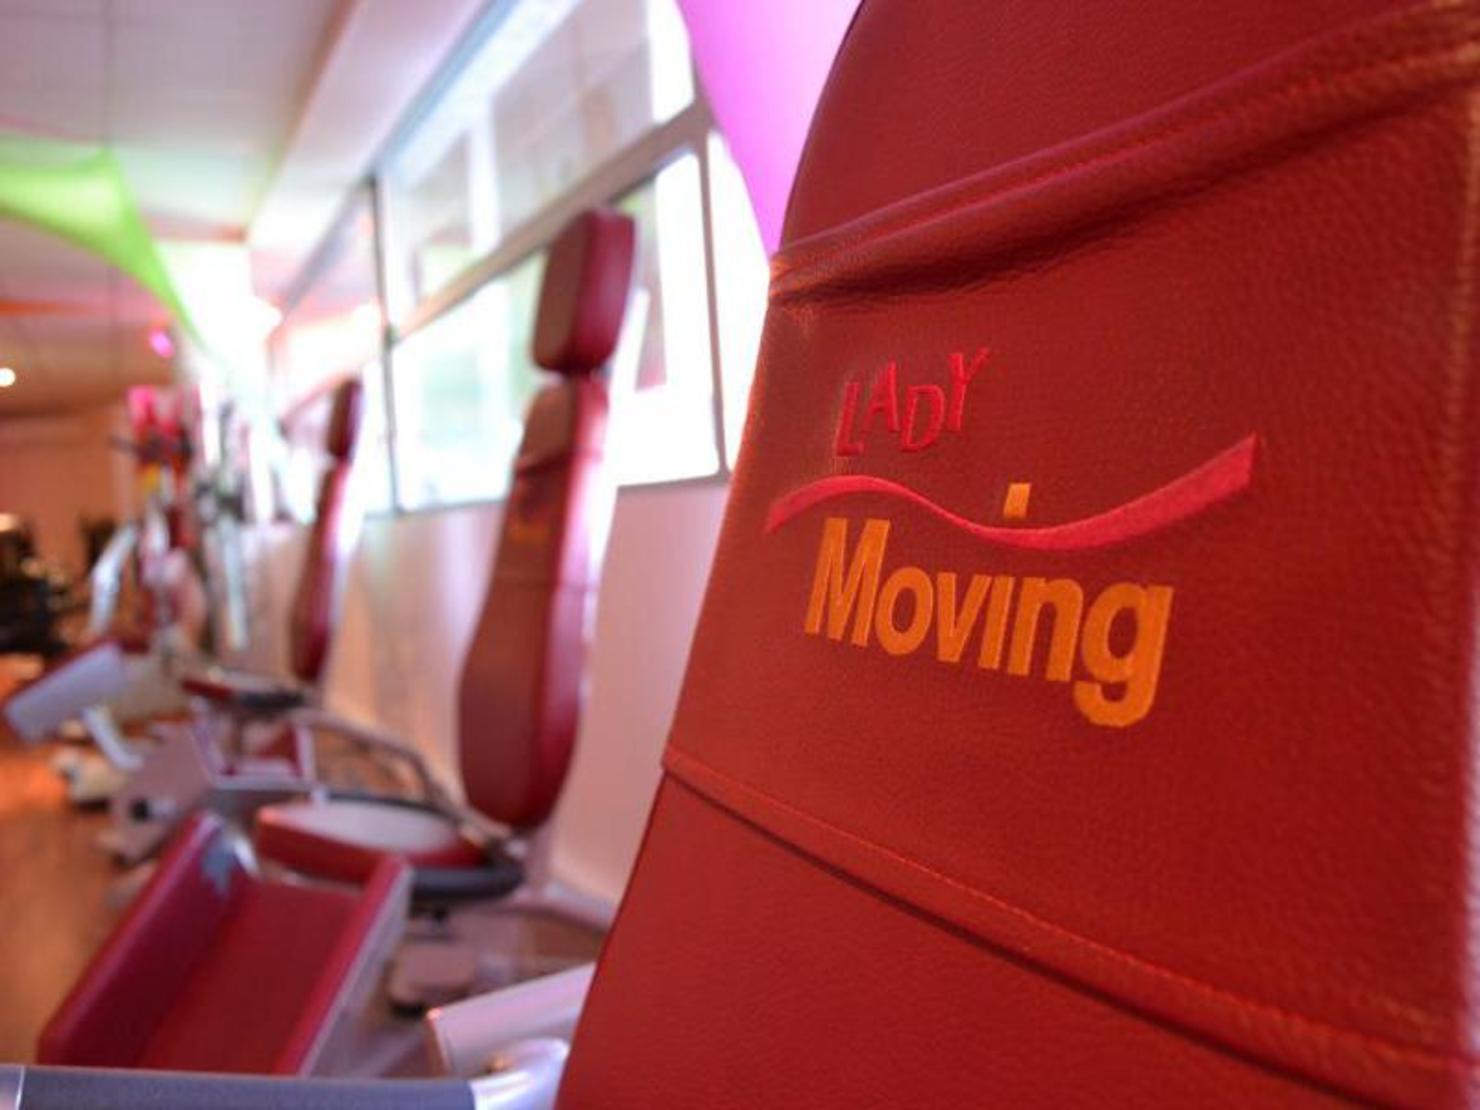 Lady Moving Nantes